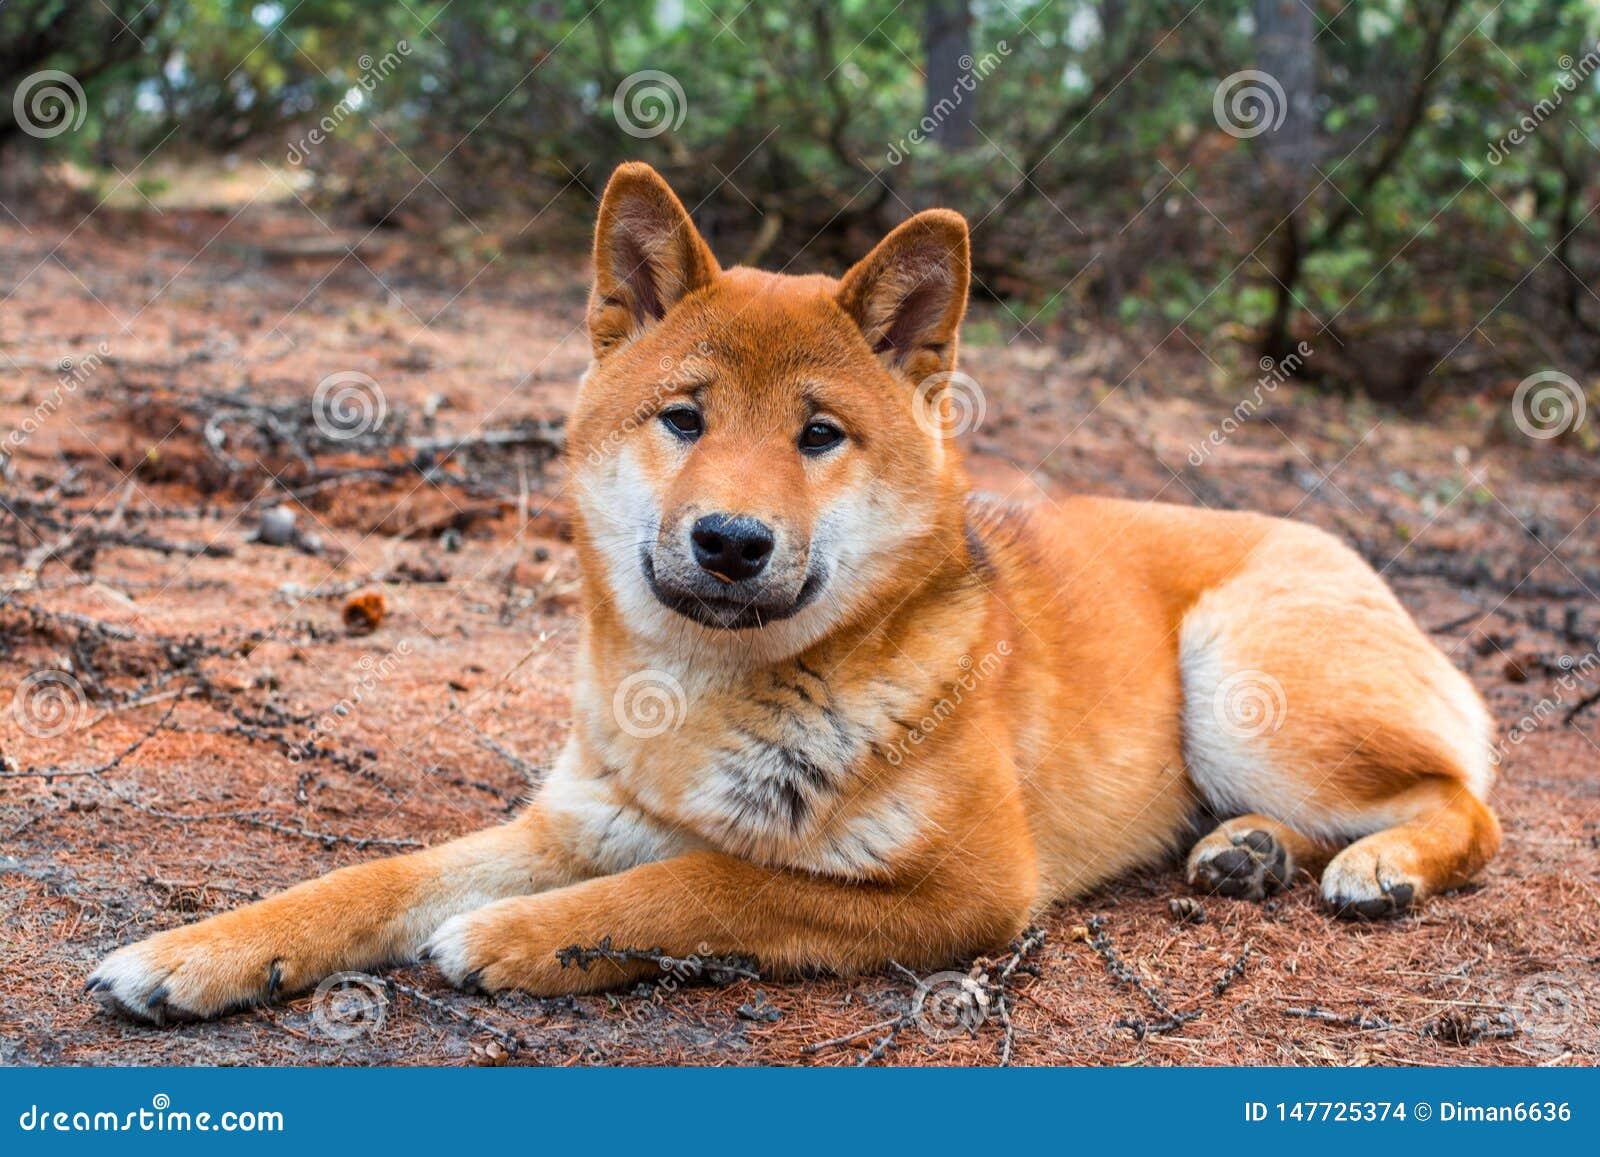 Jonge hondshiba-inu ligt ter plaatse rustend